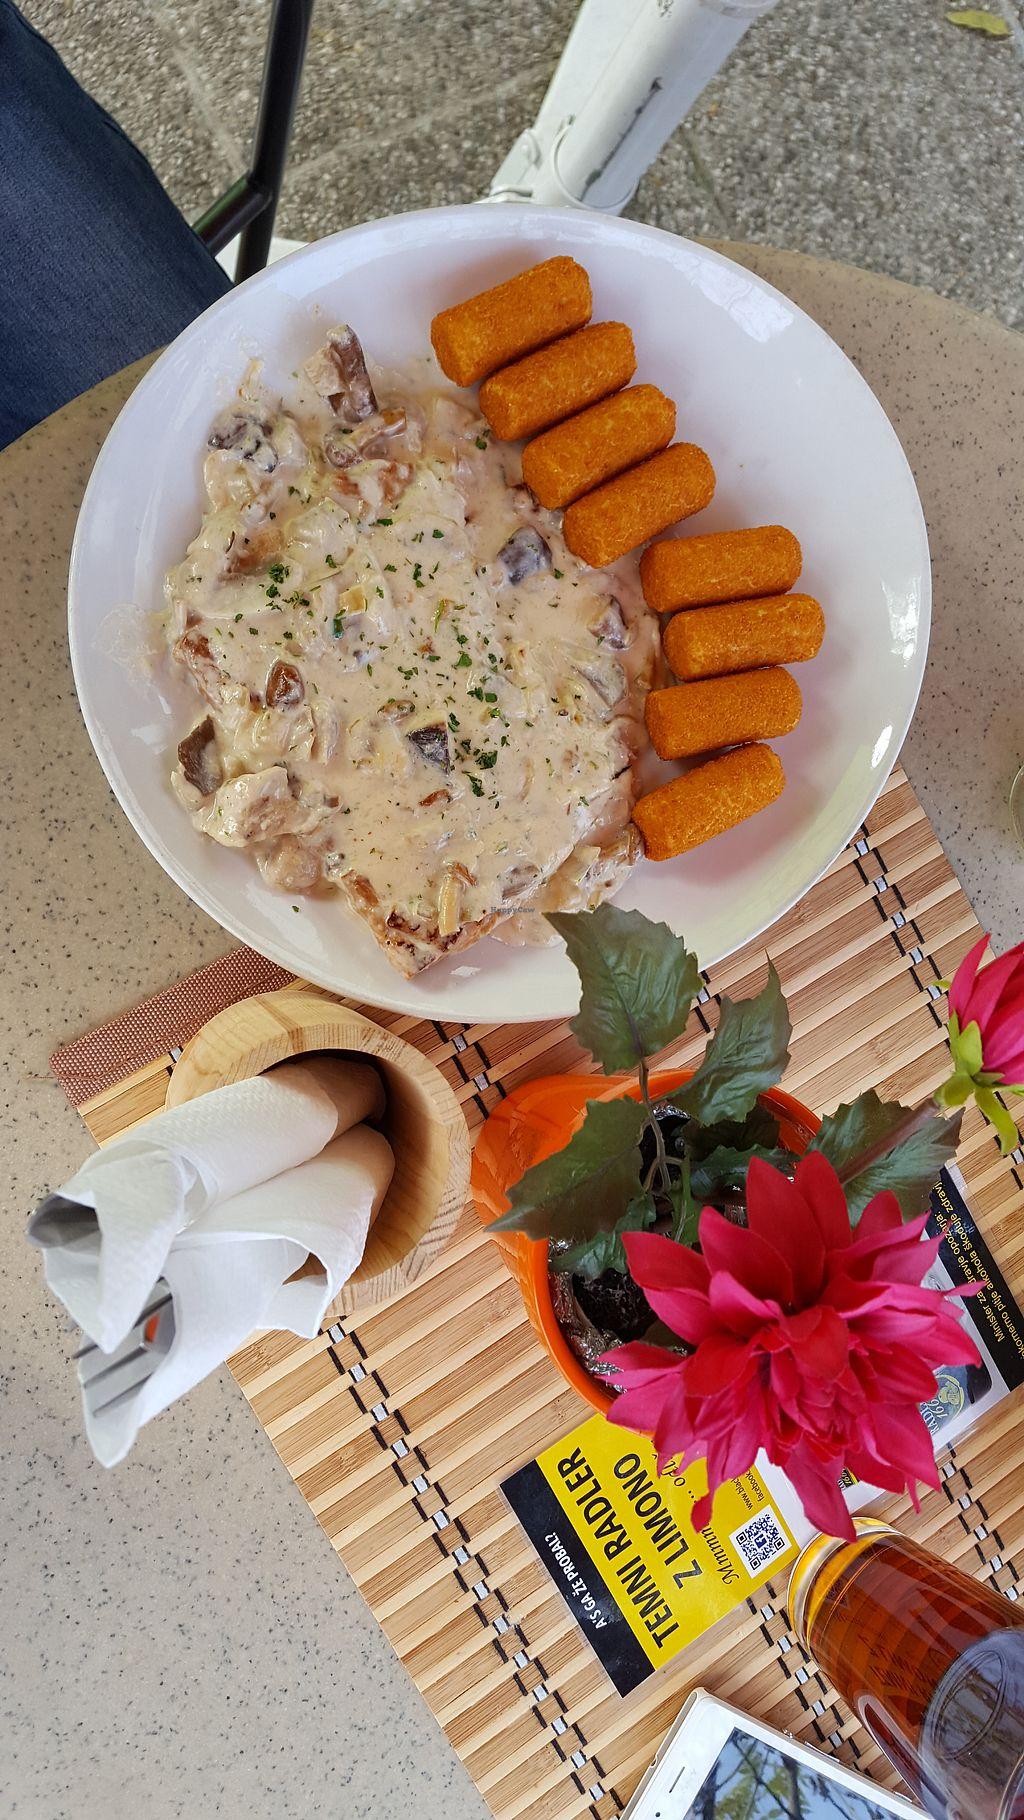 "Photo of Pizzerija Romano  by <a href=""/members/profile/Seiashun"">Seiashun</a> <br/>Seitan ""steak"" in a mushroom sauce with potato croquettes <br/> October 21, 2017  - <a href='/contact/abuse/image/76507/317381'>Report</a>"